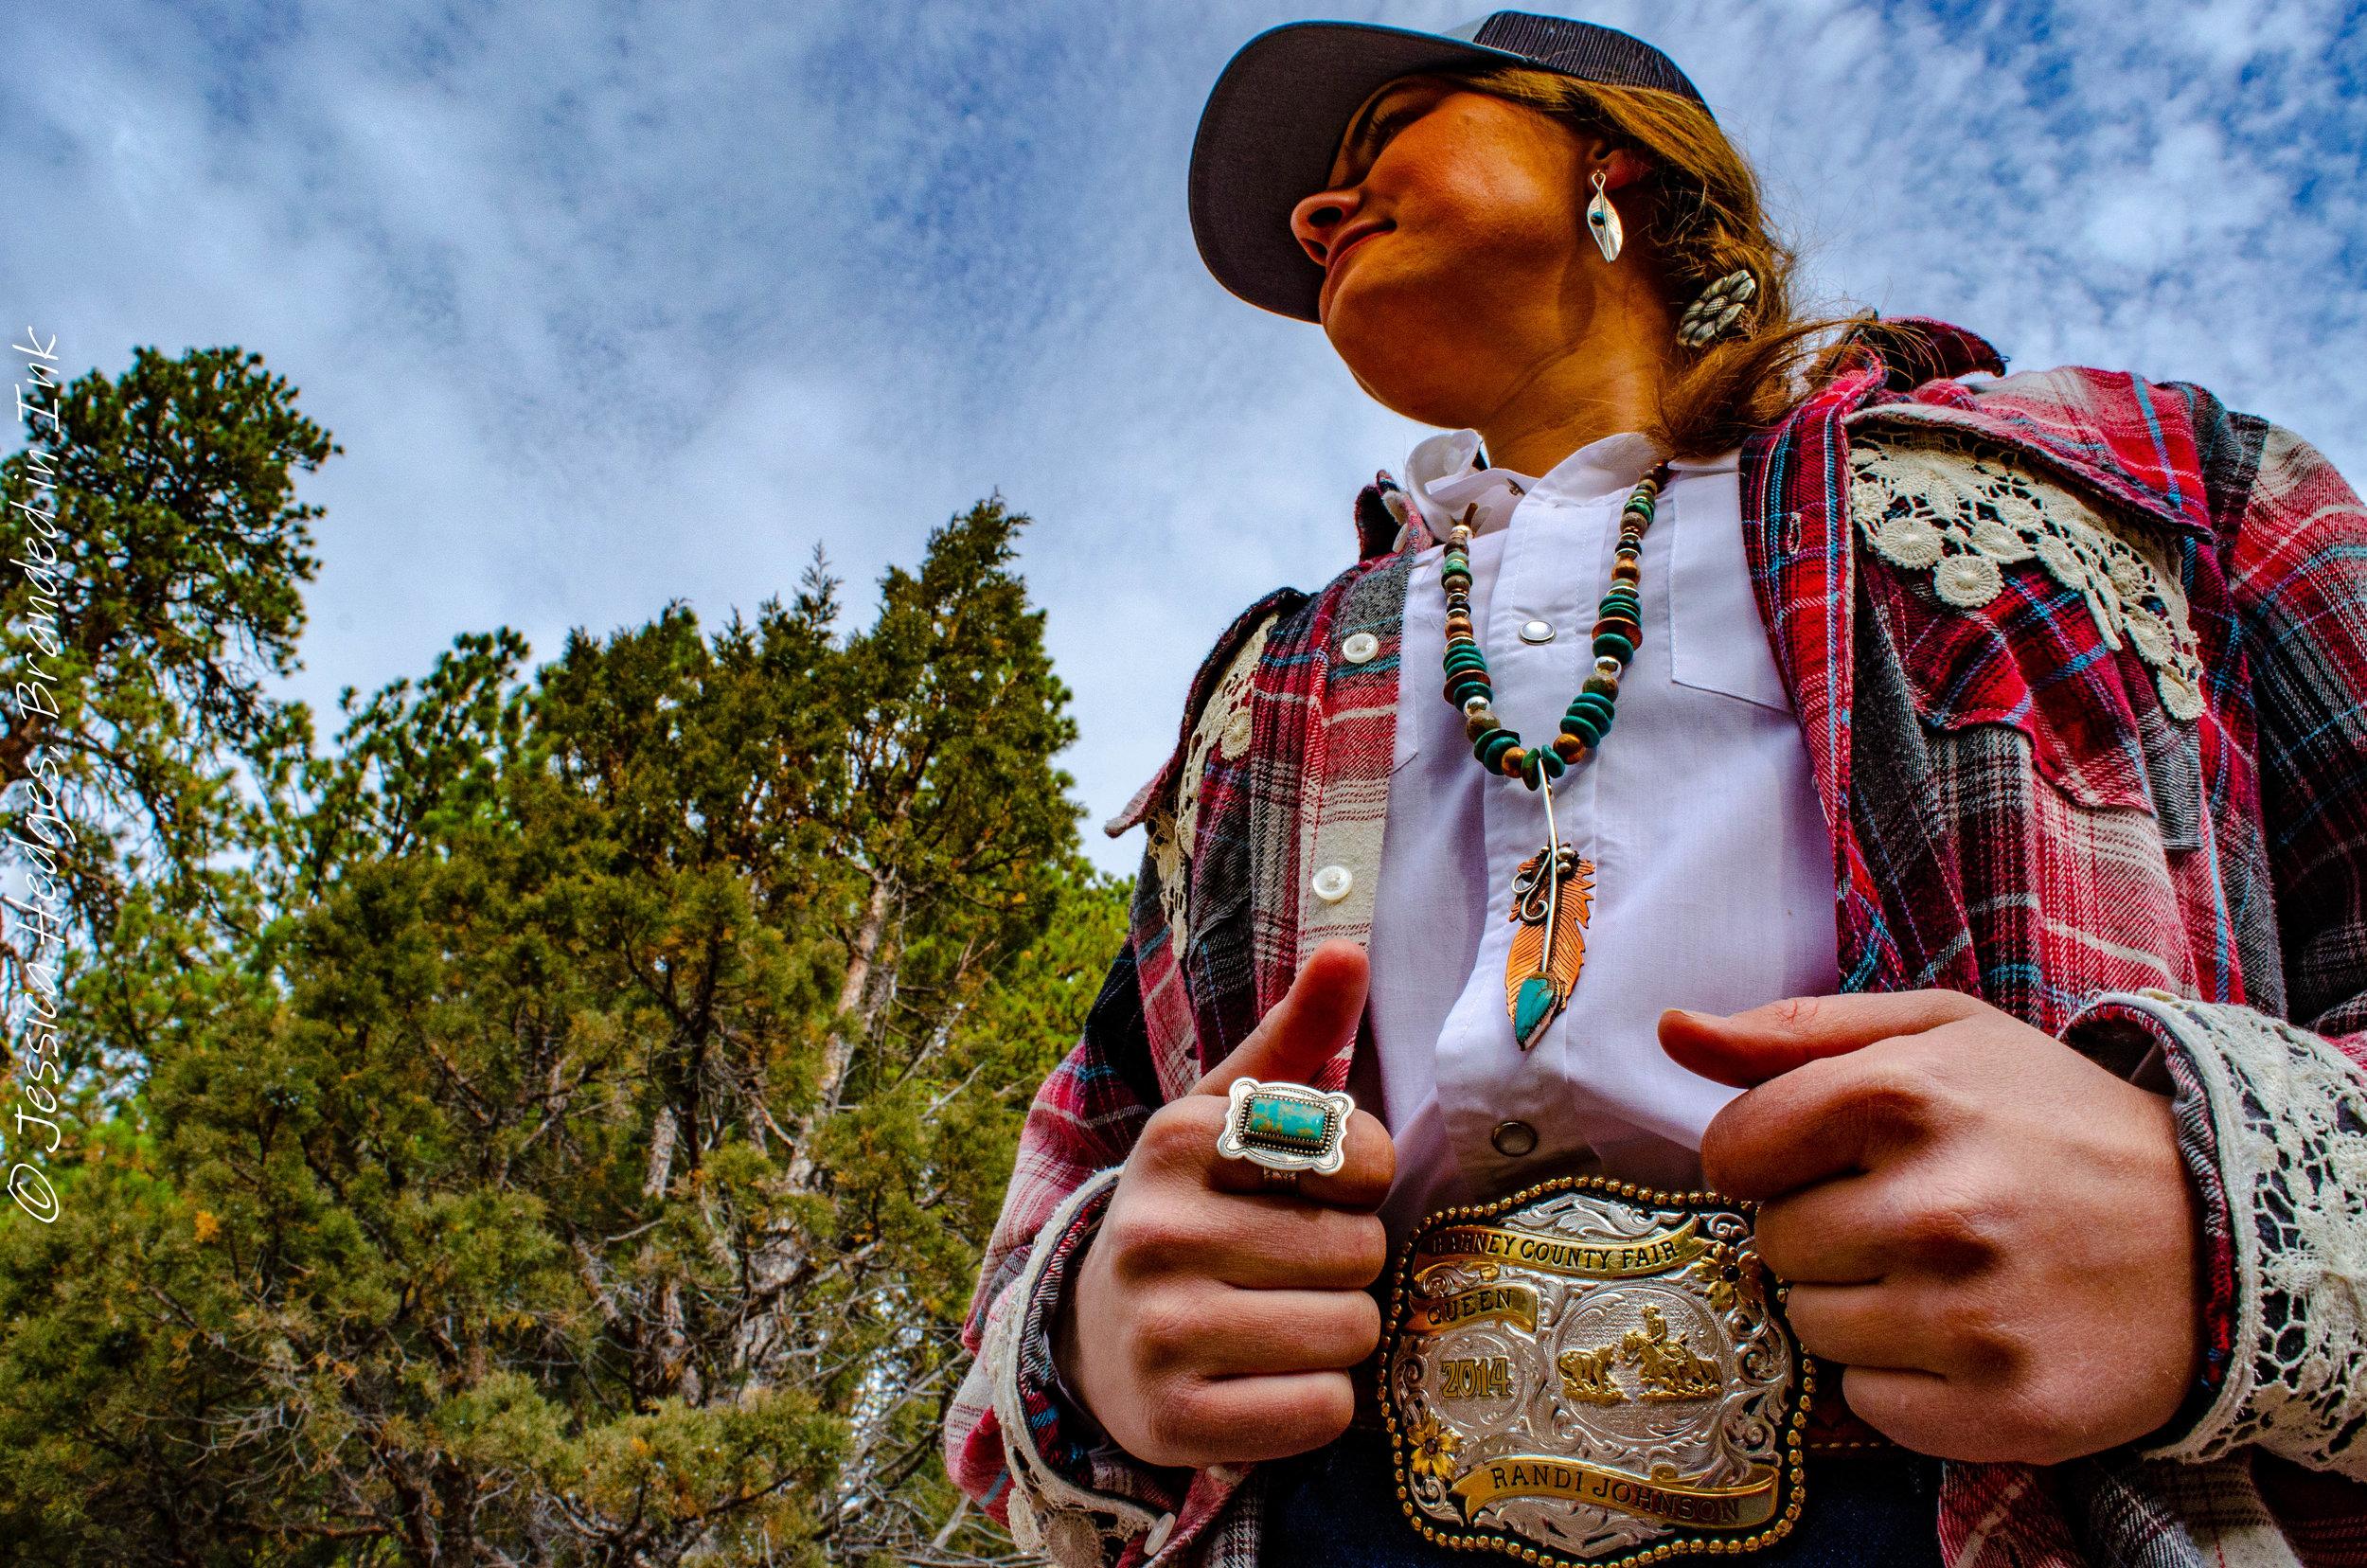 Randi Johnson, Melinda Horn, Desert Wind Boutique, cowgirl